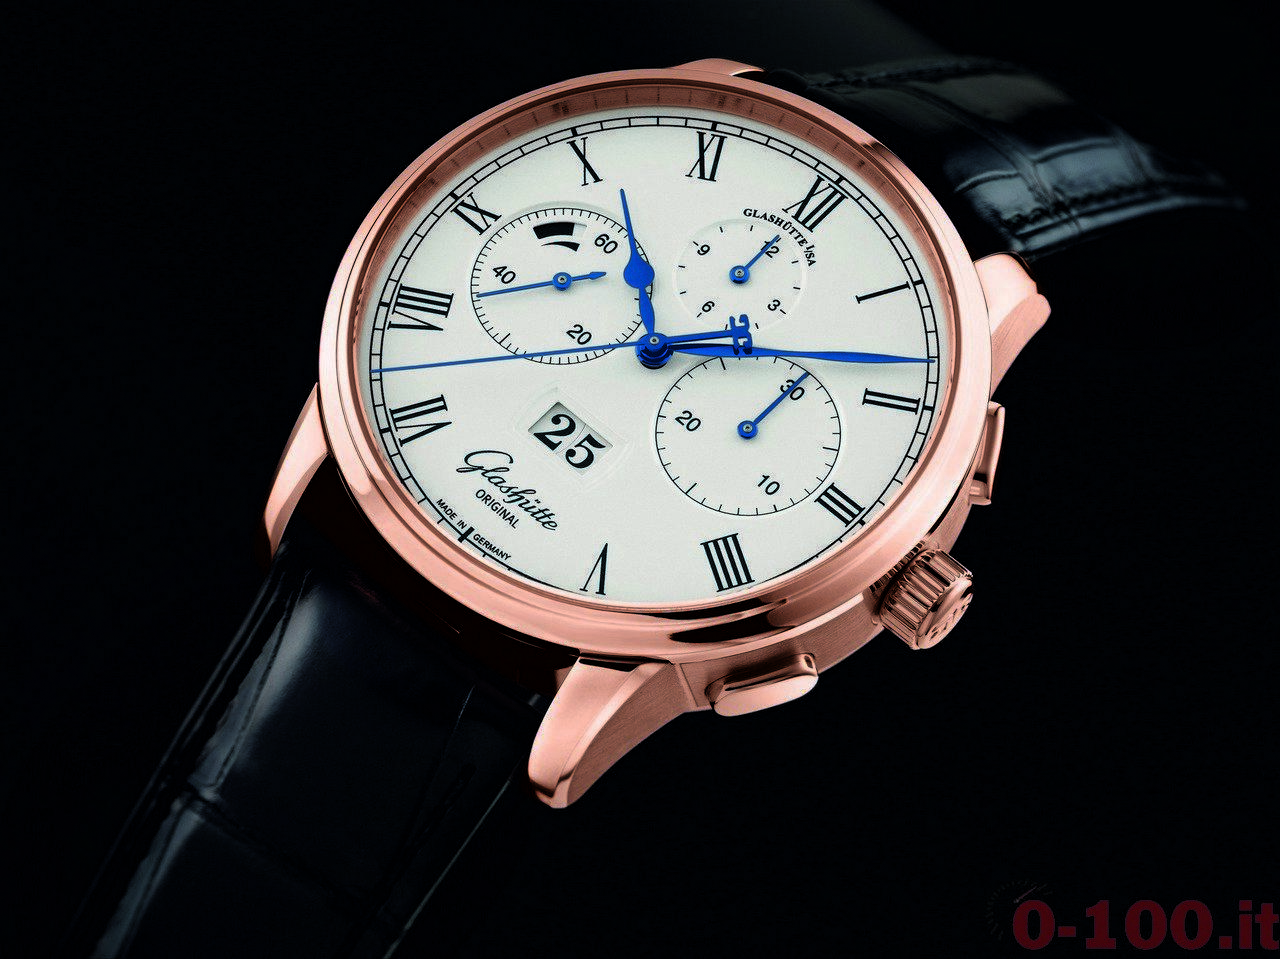 glashuette-original-senator-chronograph-panorama-date-baselworld-2014_0-100_1